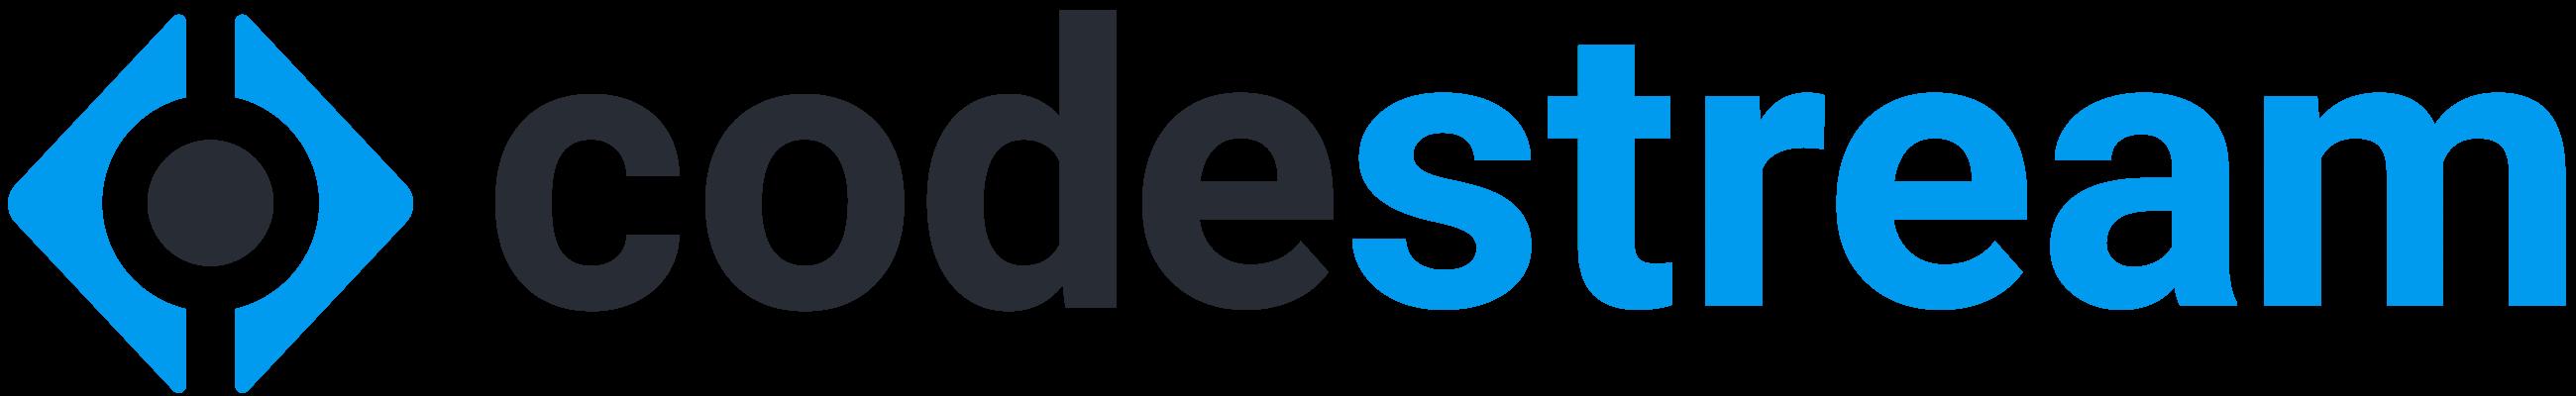 logo codestream